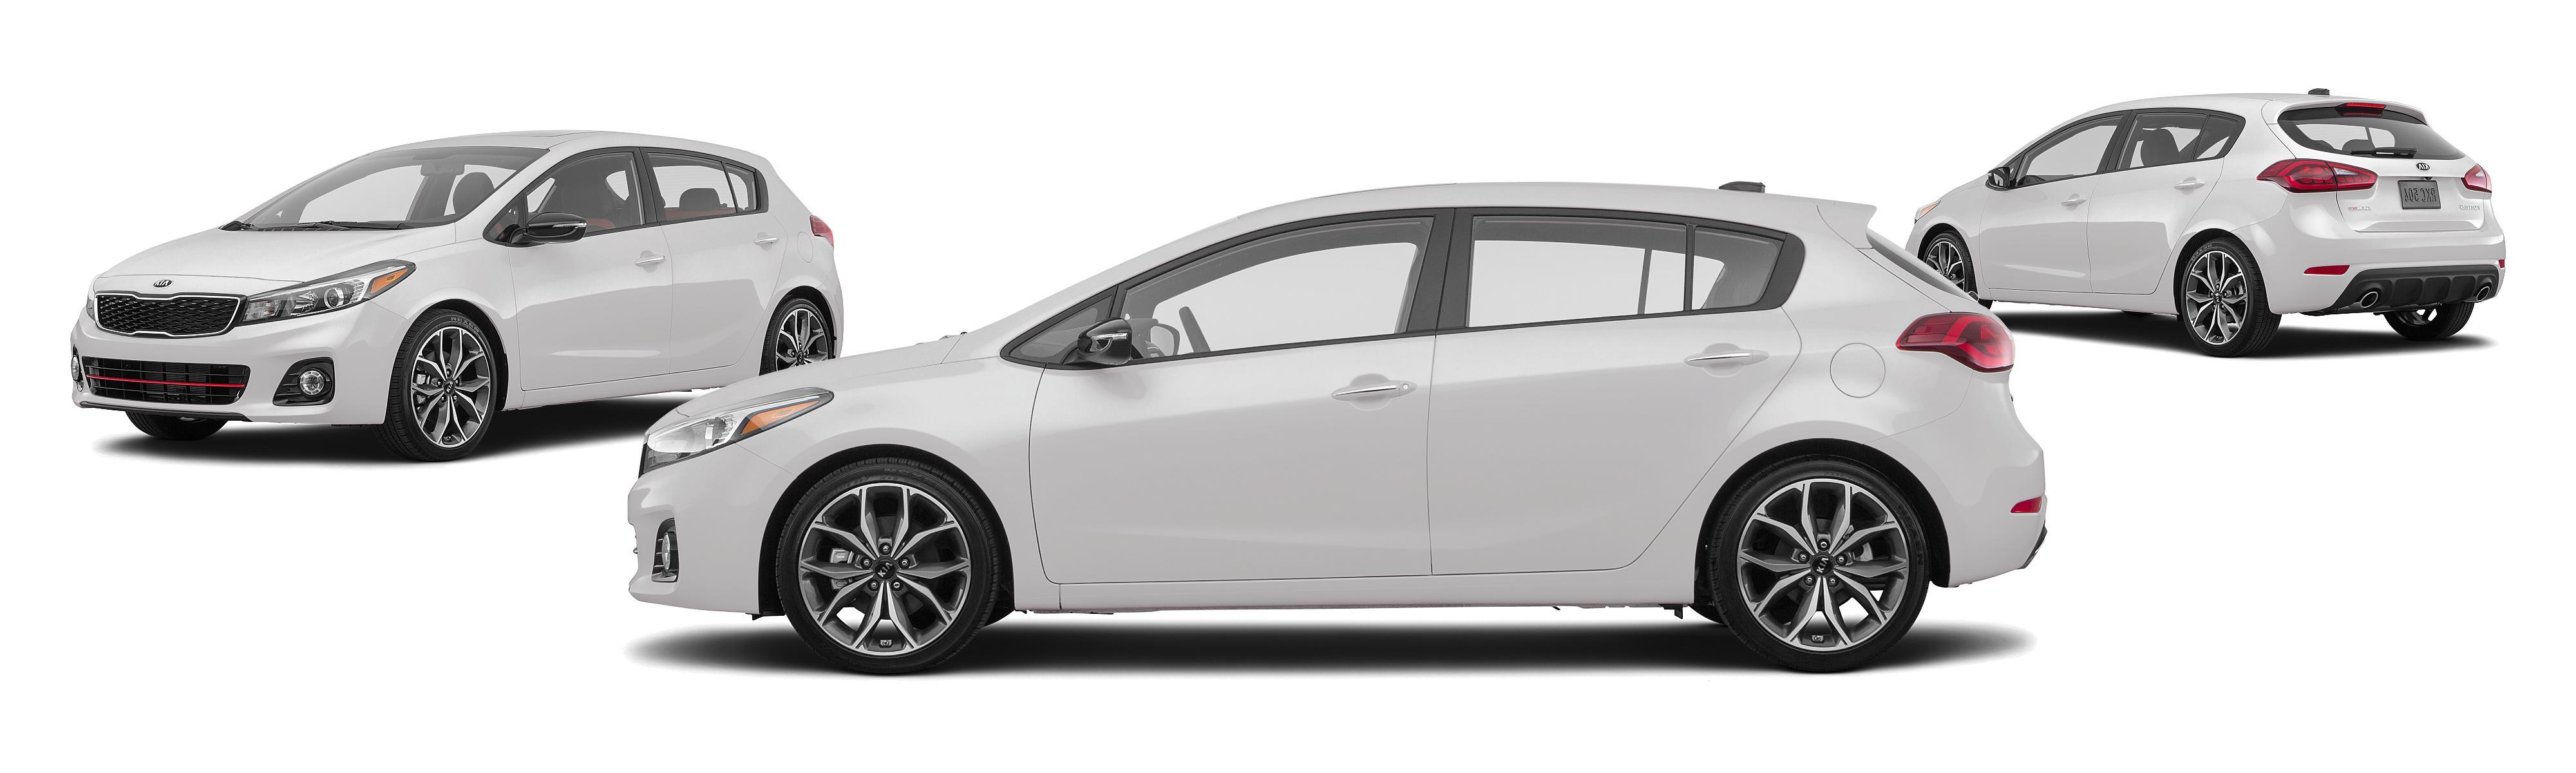 all large research beige cashmere sedan lx dealership rio groovecar kia composite horsepower about wichita ks